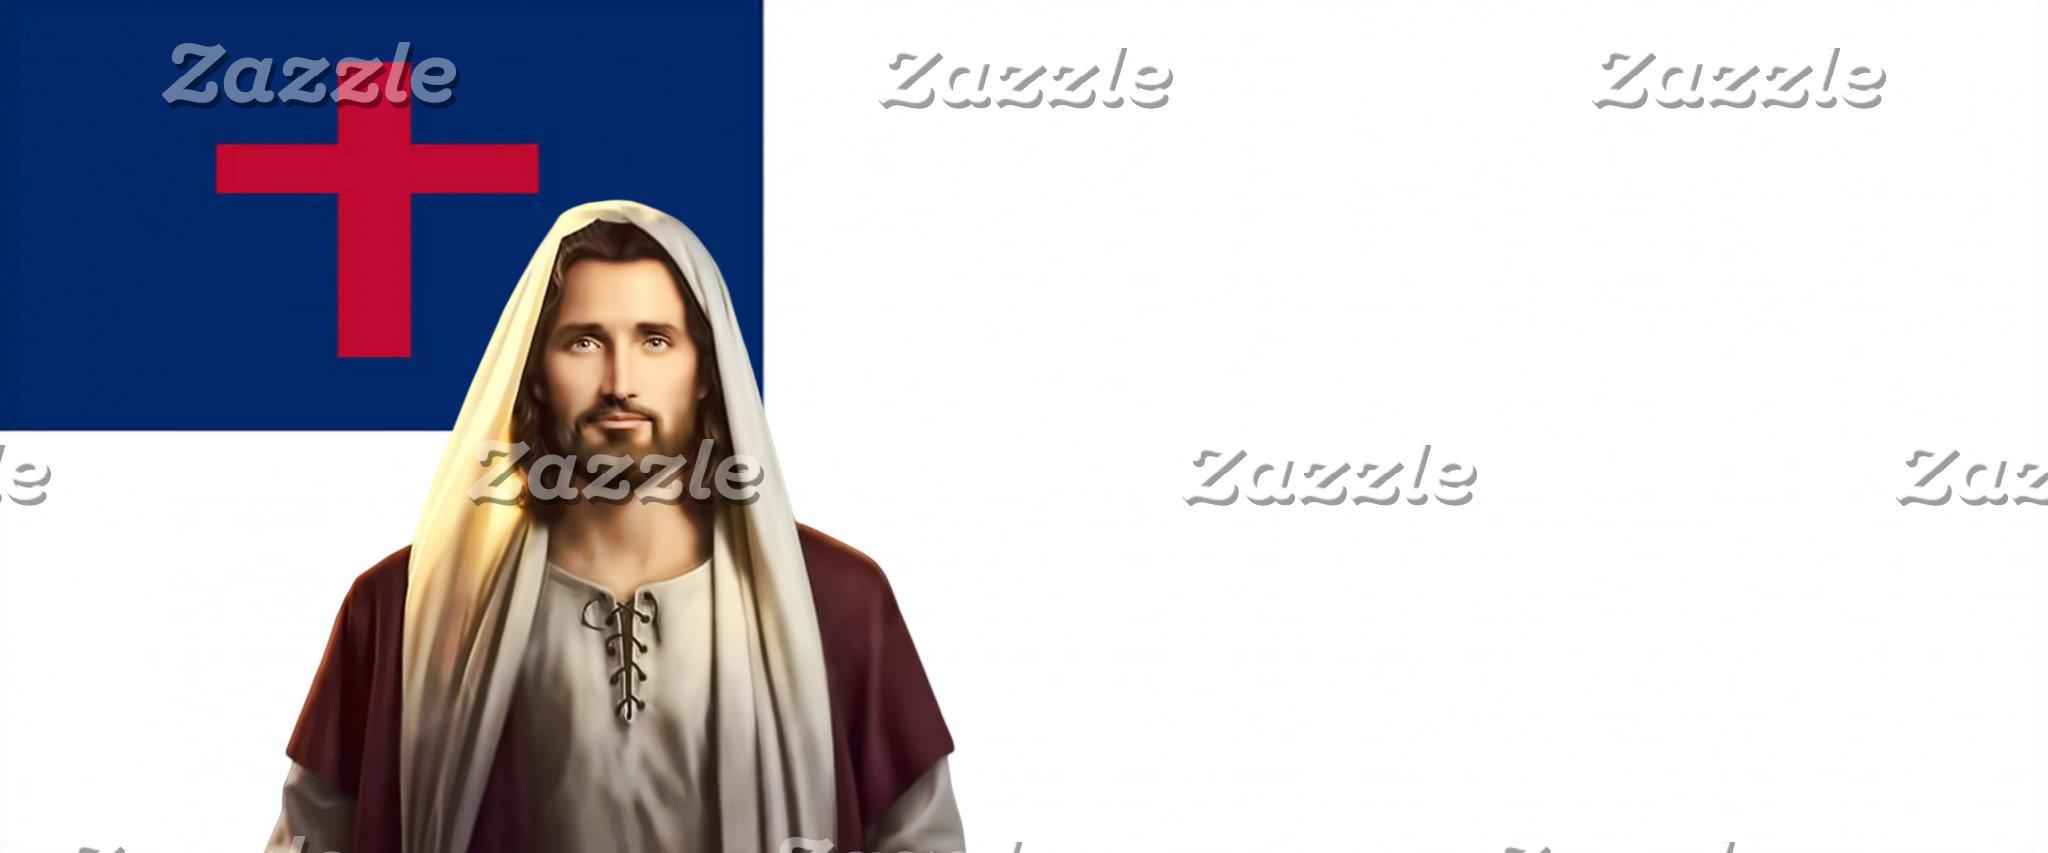 Christian Designs